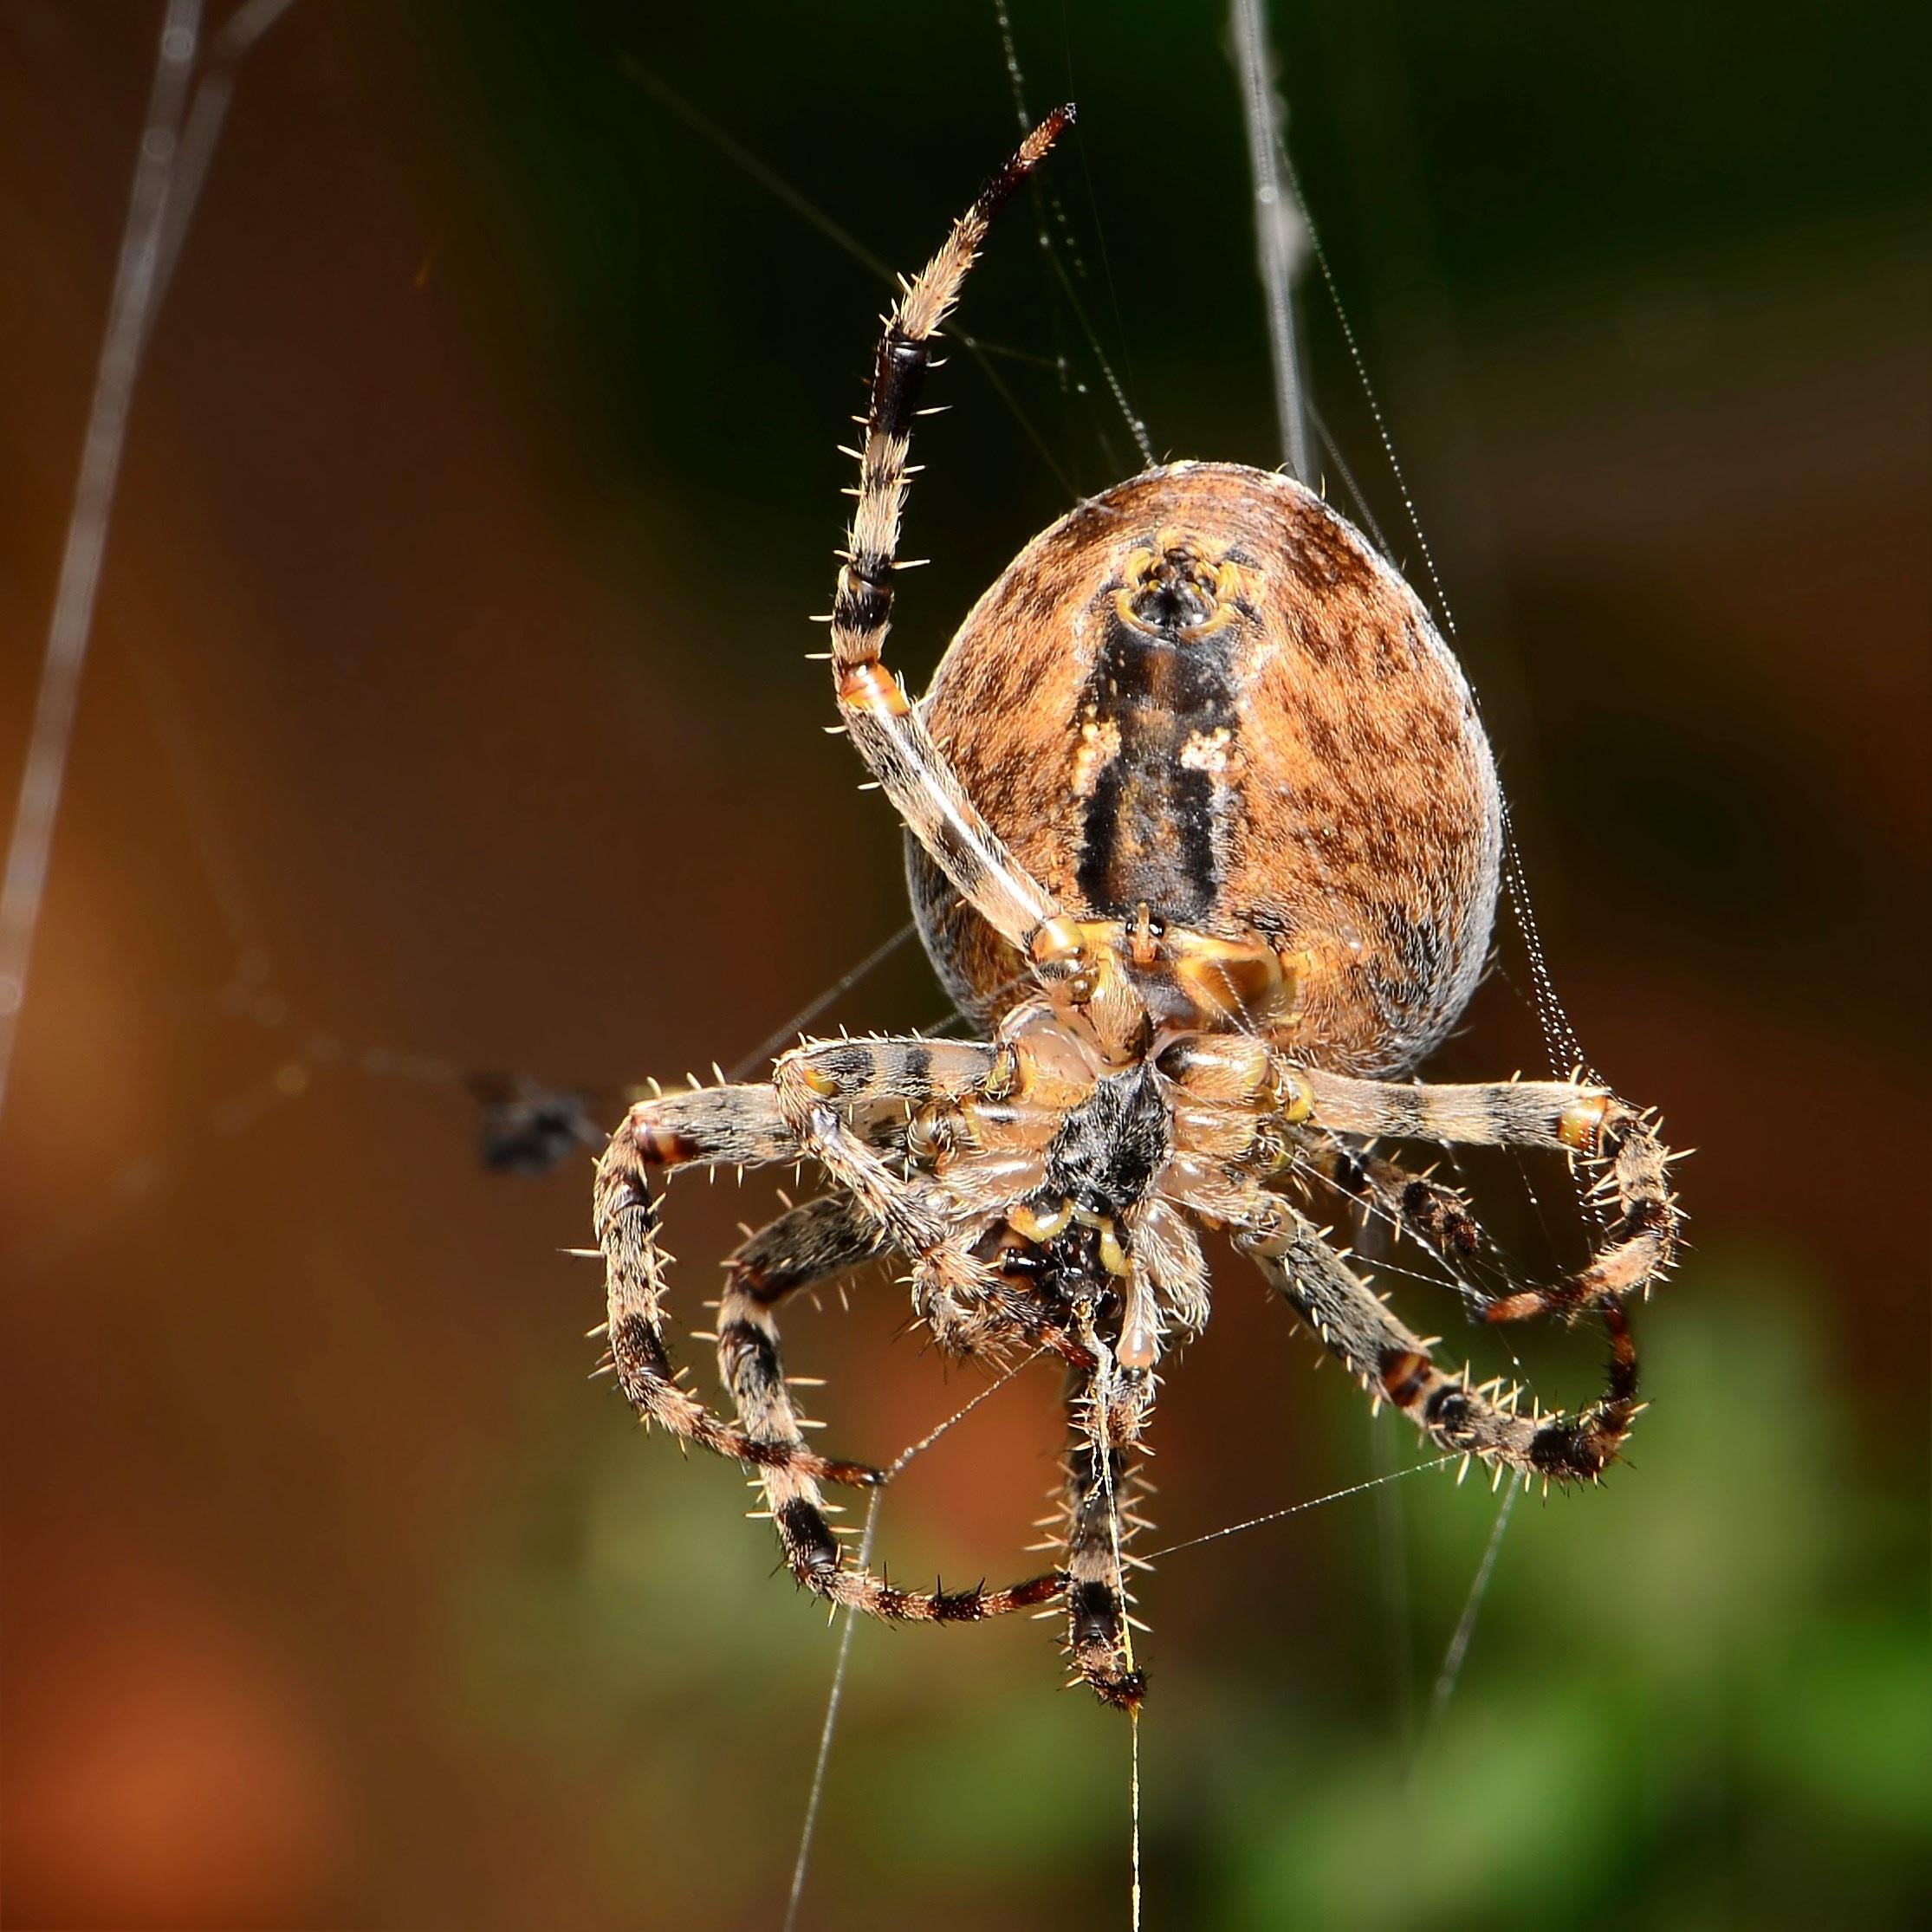 Free Images : nature, fauna, invertebrate, spider web, close up ...